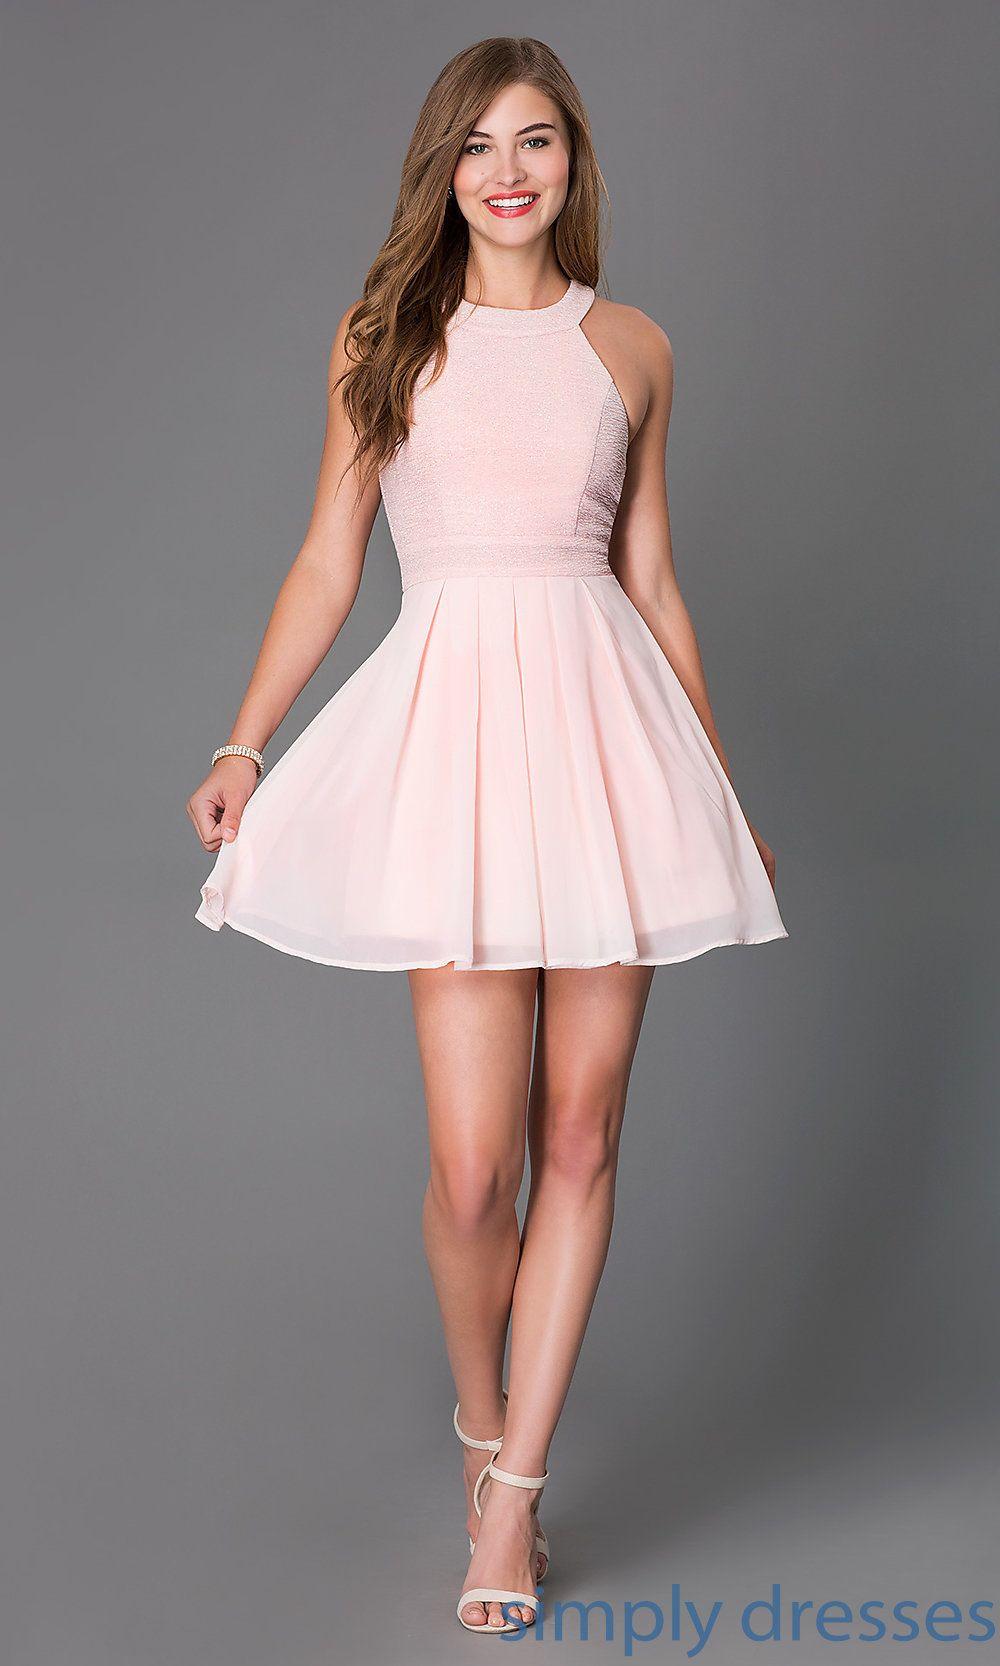 5d86597ff15 Shop sleeveless blush pink short glitter print cocktail dresses at  SimplyDresses. Semi formal prom dresses